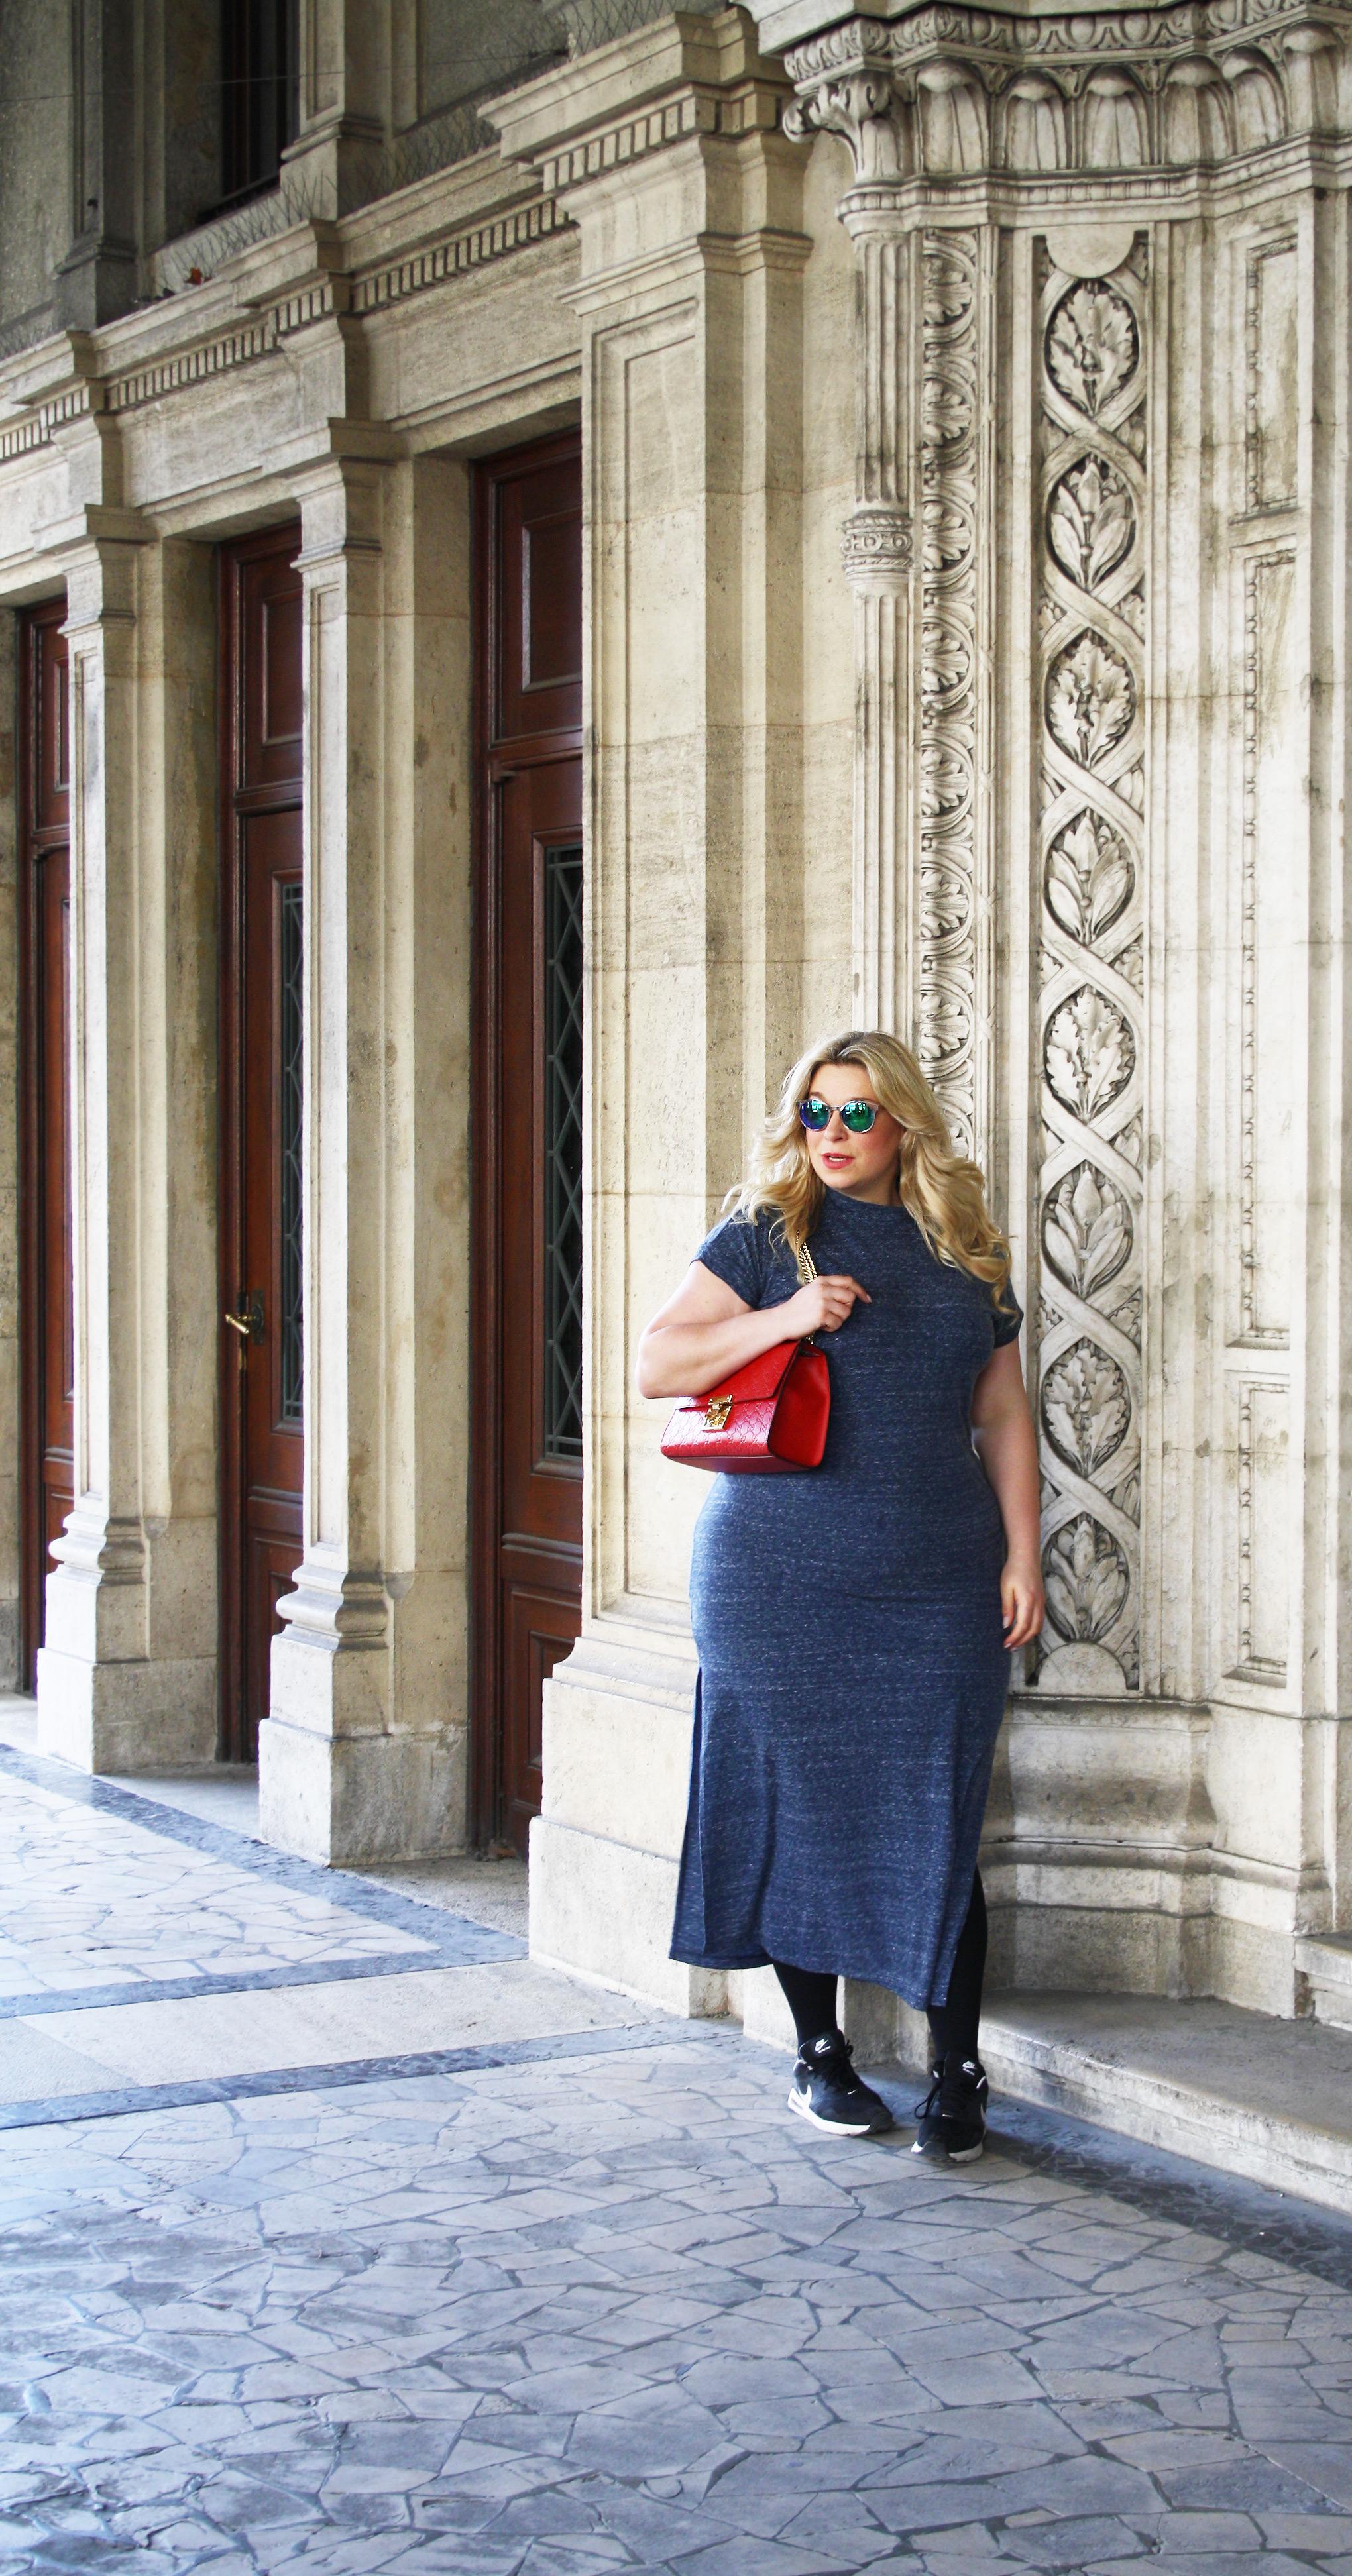 Wien-Megabambi-guccibag-Red-Plussize-Plussize-Blogger-berlin-Caterina-pogorzelski